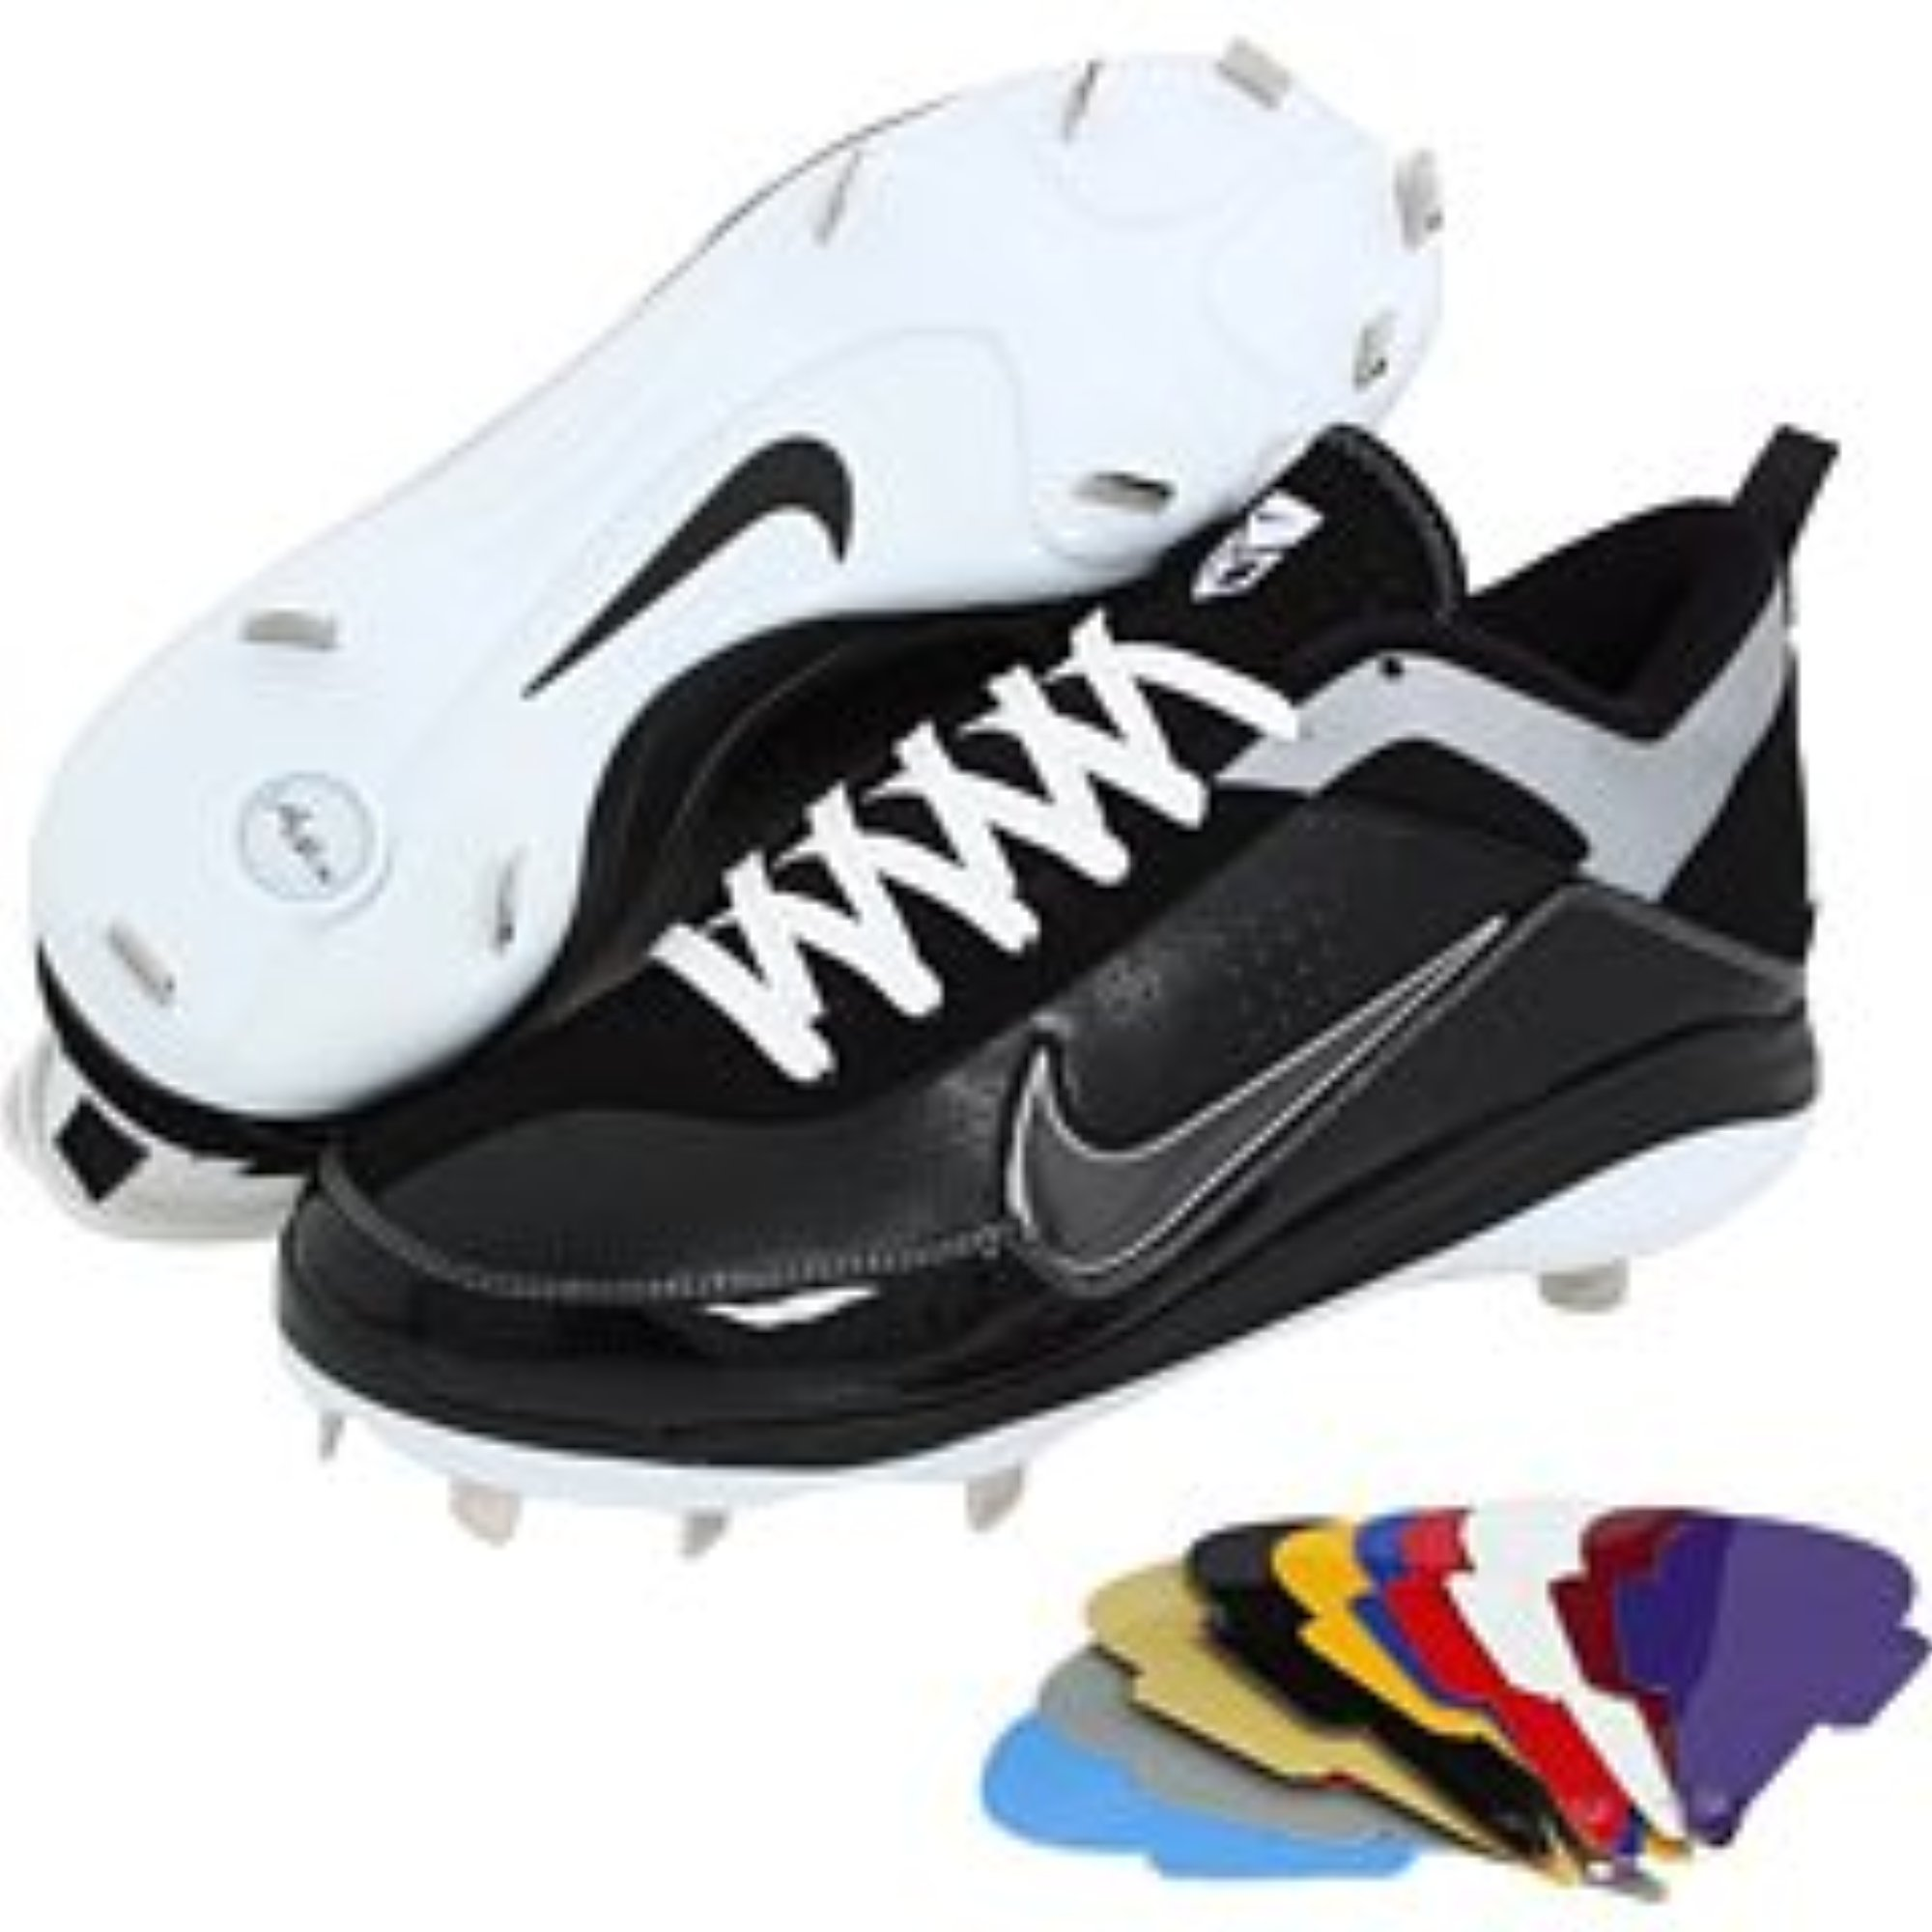 Nike AIR Show Elite 2 (Mens), Baseball Cleats - Size 10